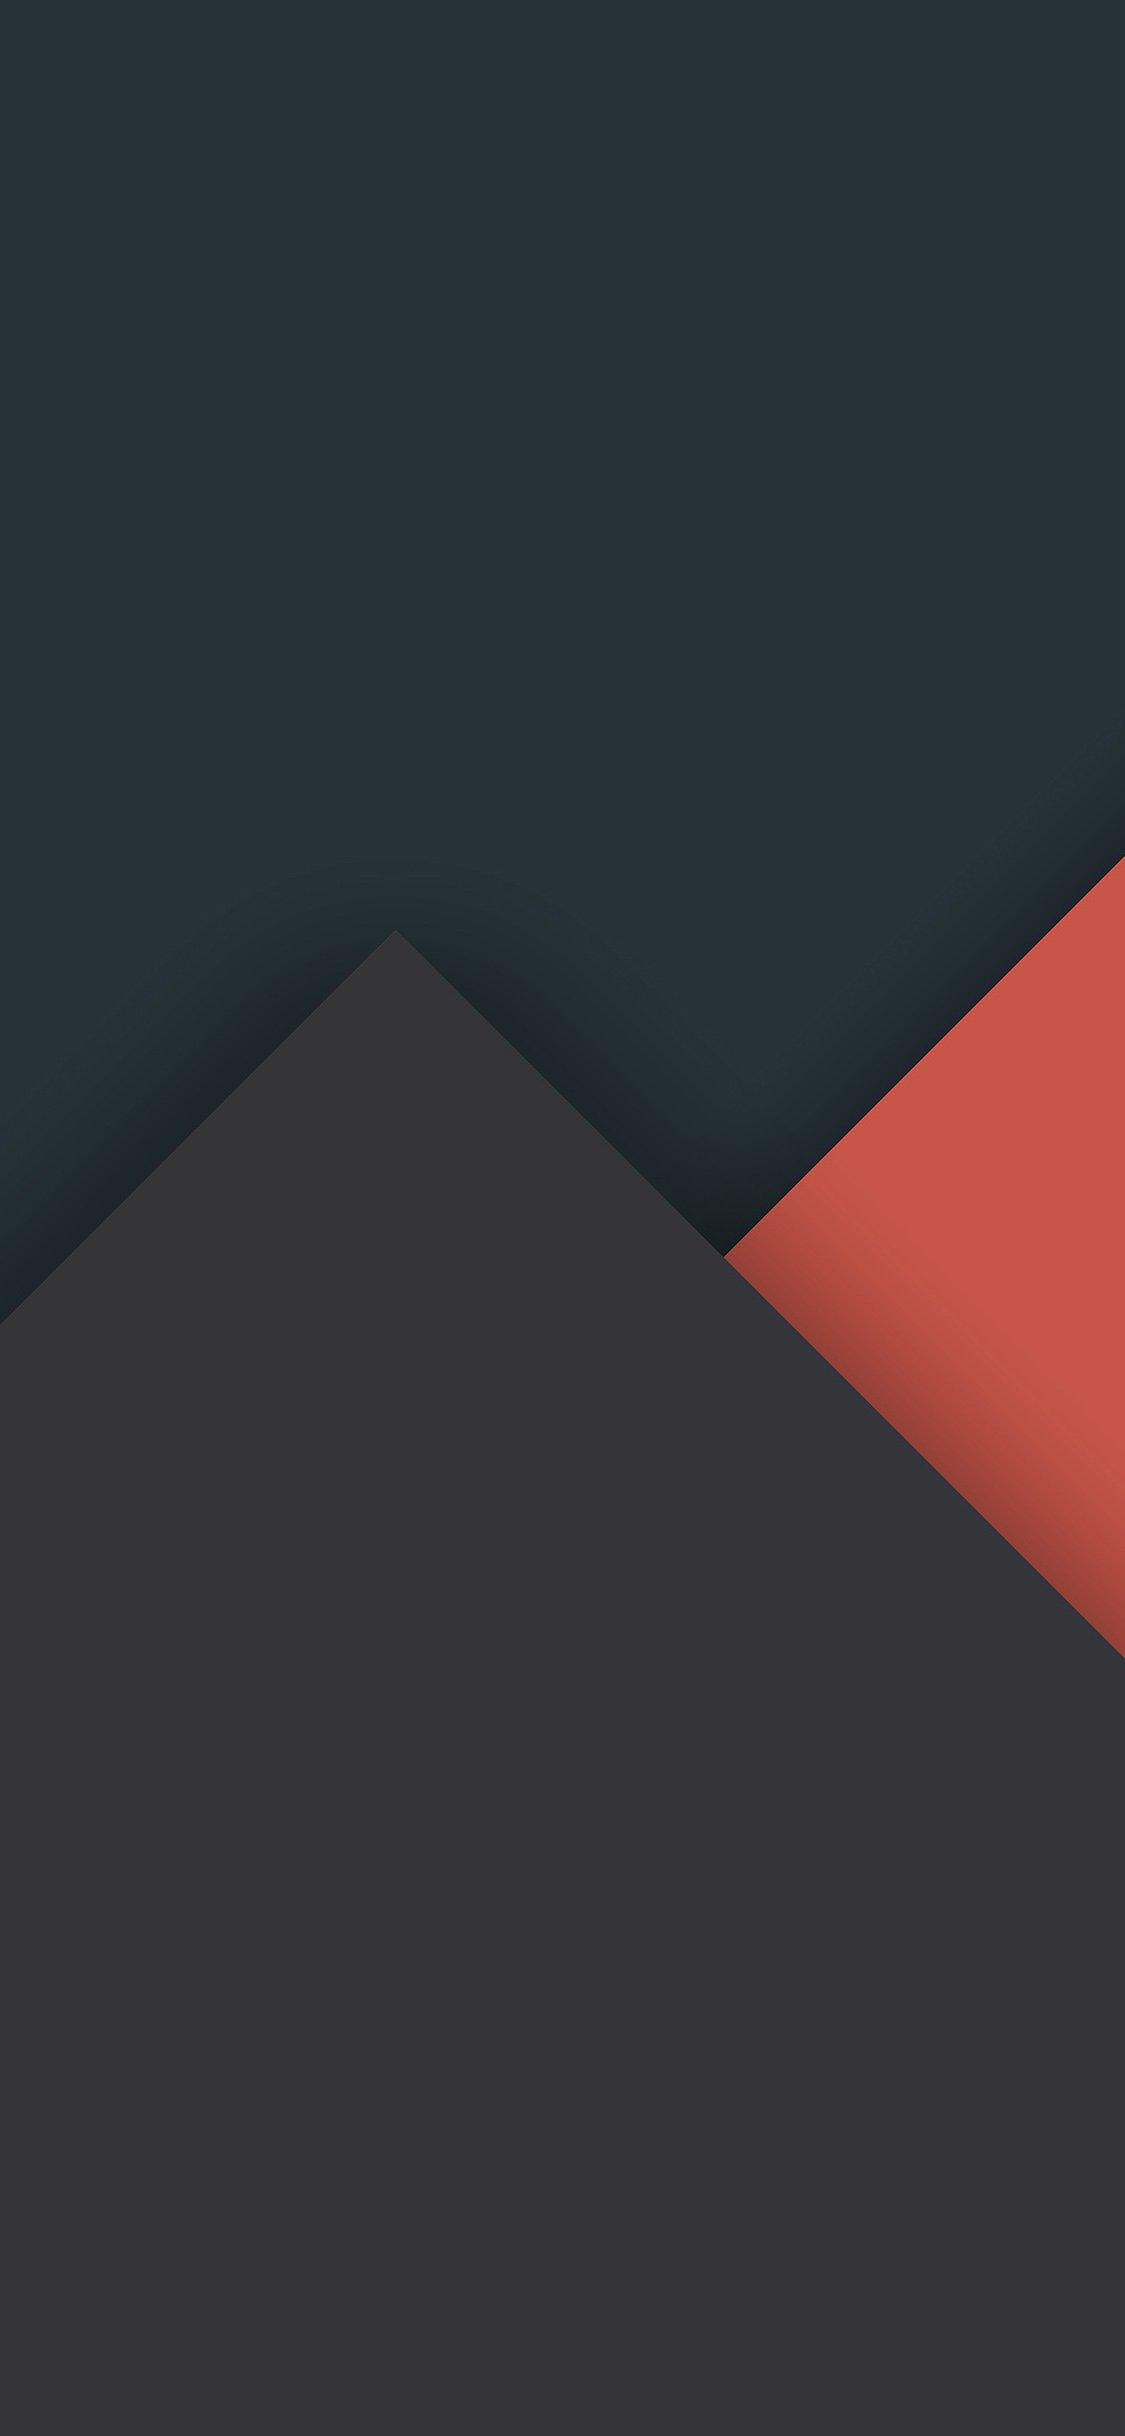 Iphone X Wallpaper Design   21x21 Wallpaper   teahub.io